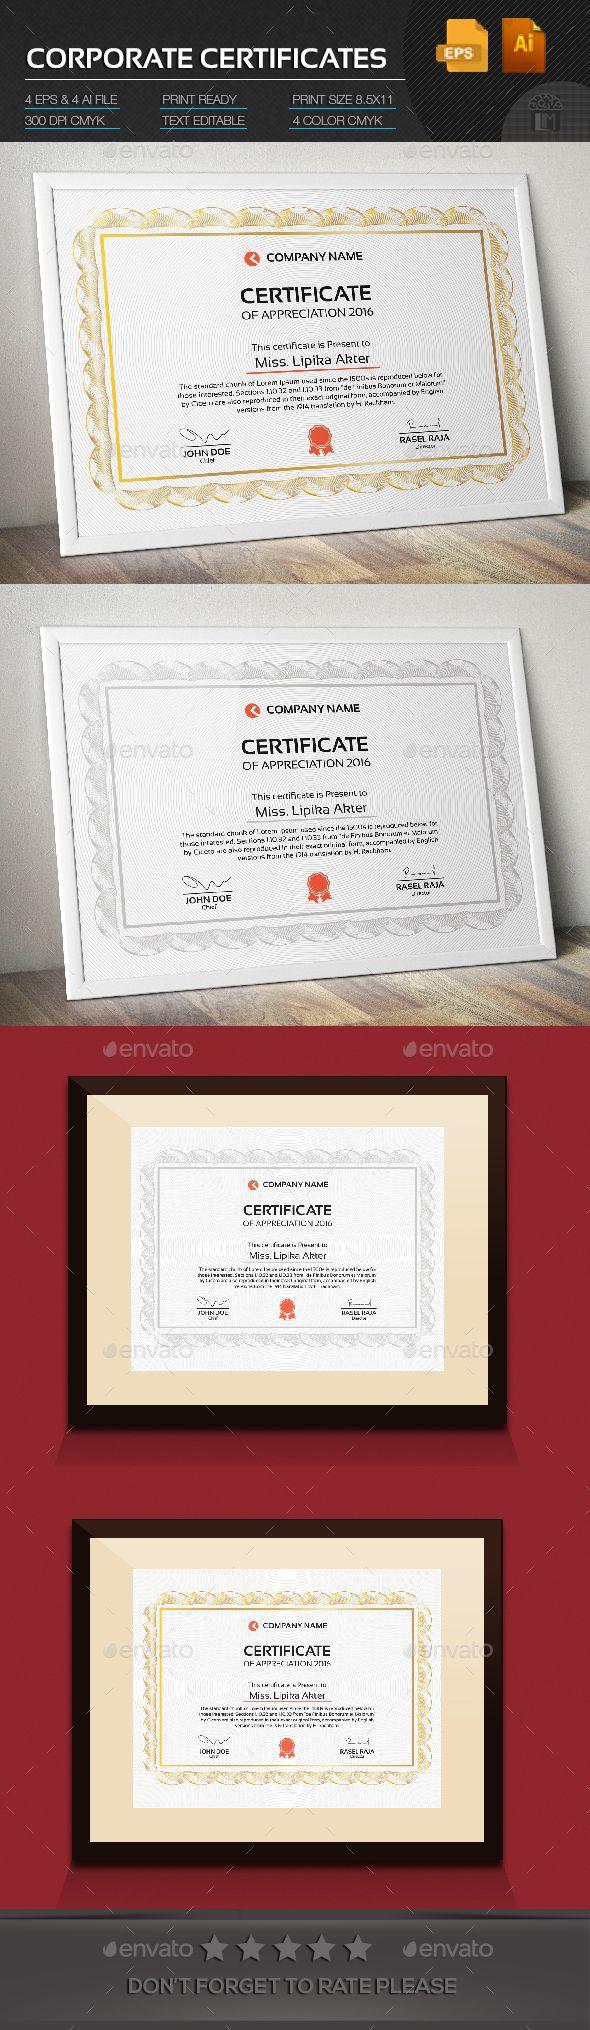 Corporate Certificate Template Vector EPS, AI #design Download: http://graphicriver.net/item/corporate-certificate/14484839?ref=ksioks